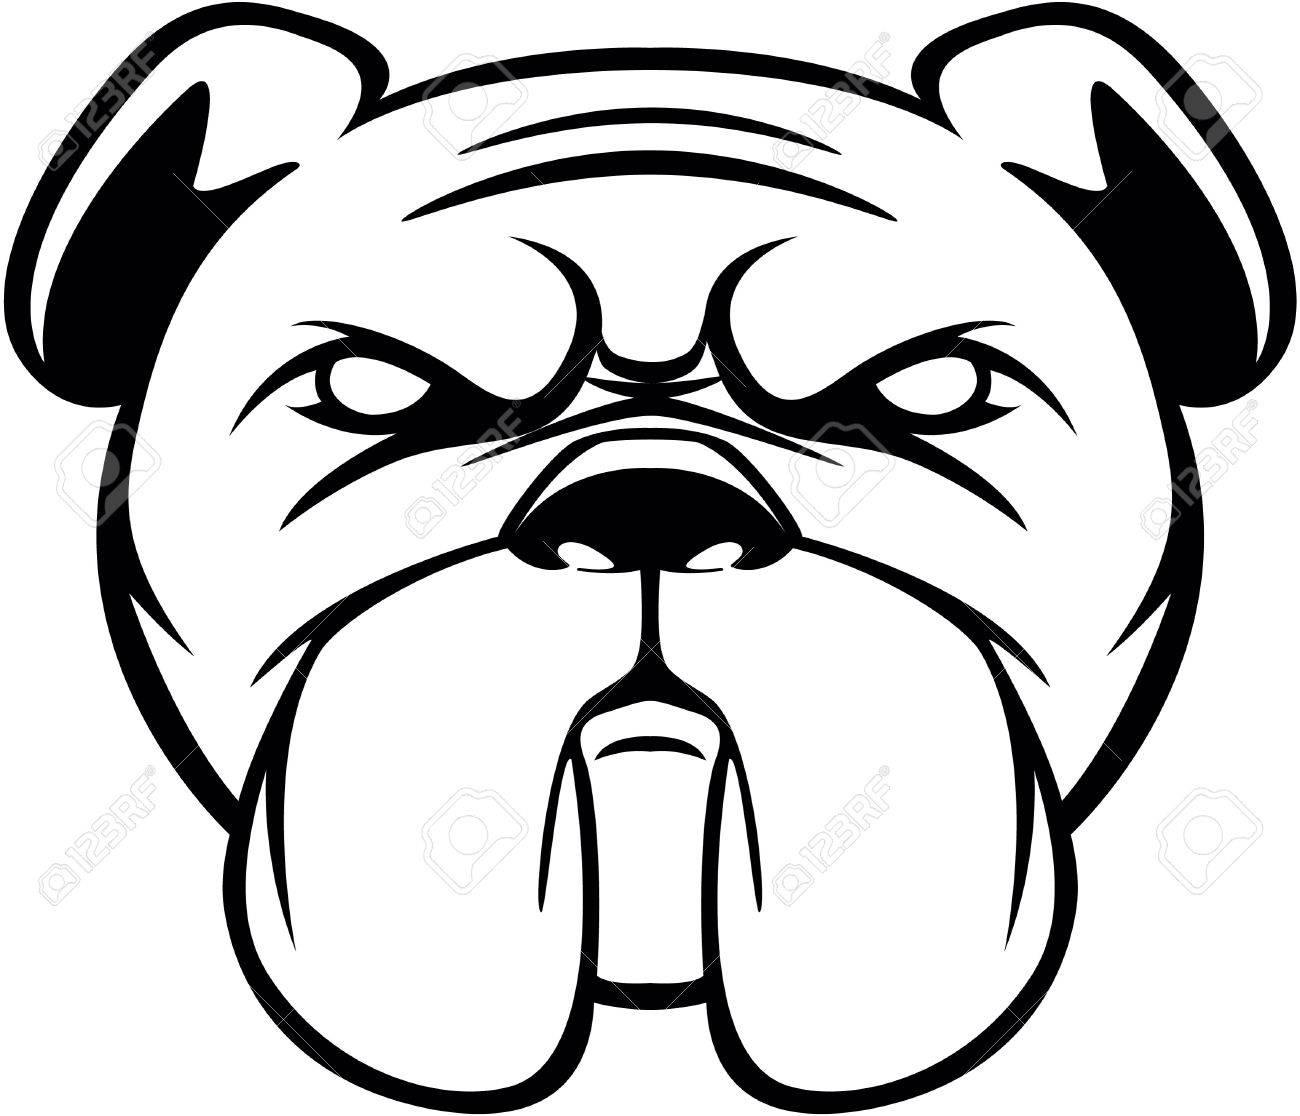 Bulldog Head Symbol Illustration Royalty Free Cliparts Vectors And